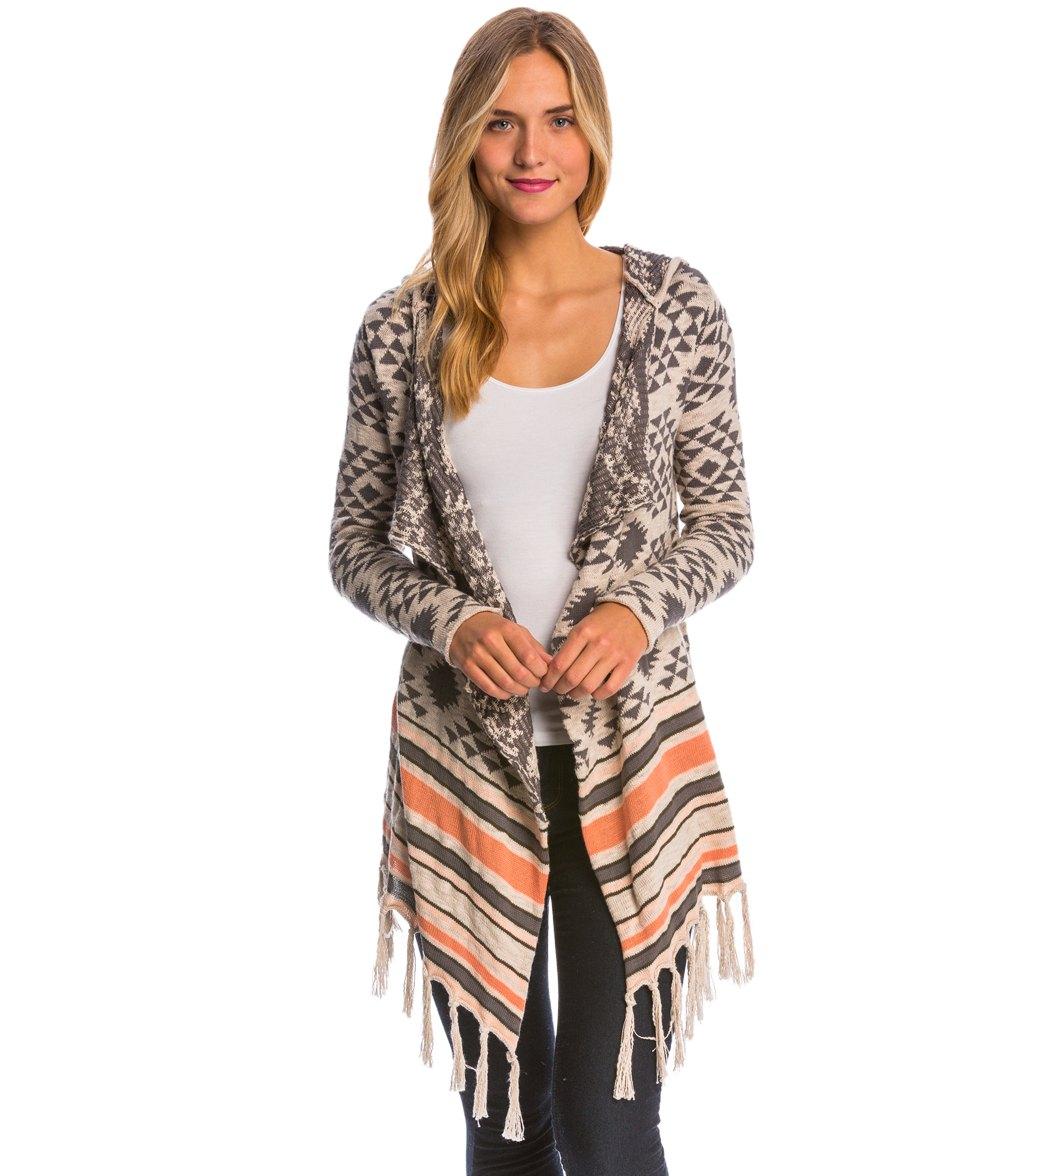 b225fa7f6a Rip Curl Desert Nights Cardigan at SwimOutlet.com - Free Shipping